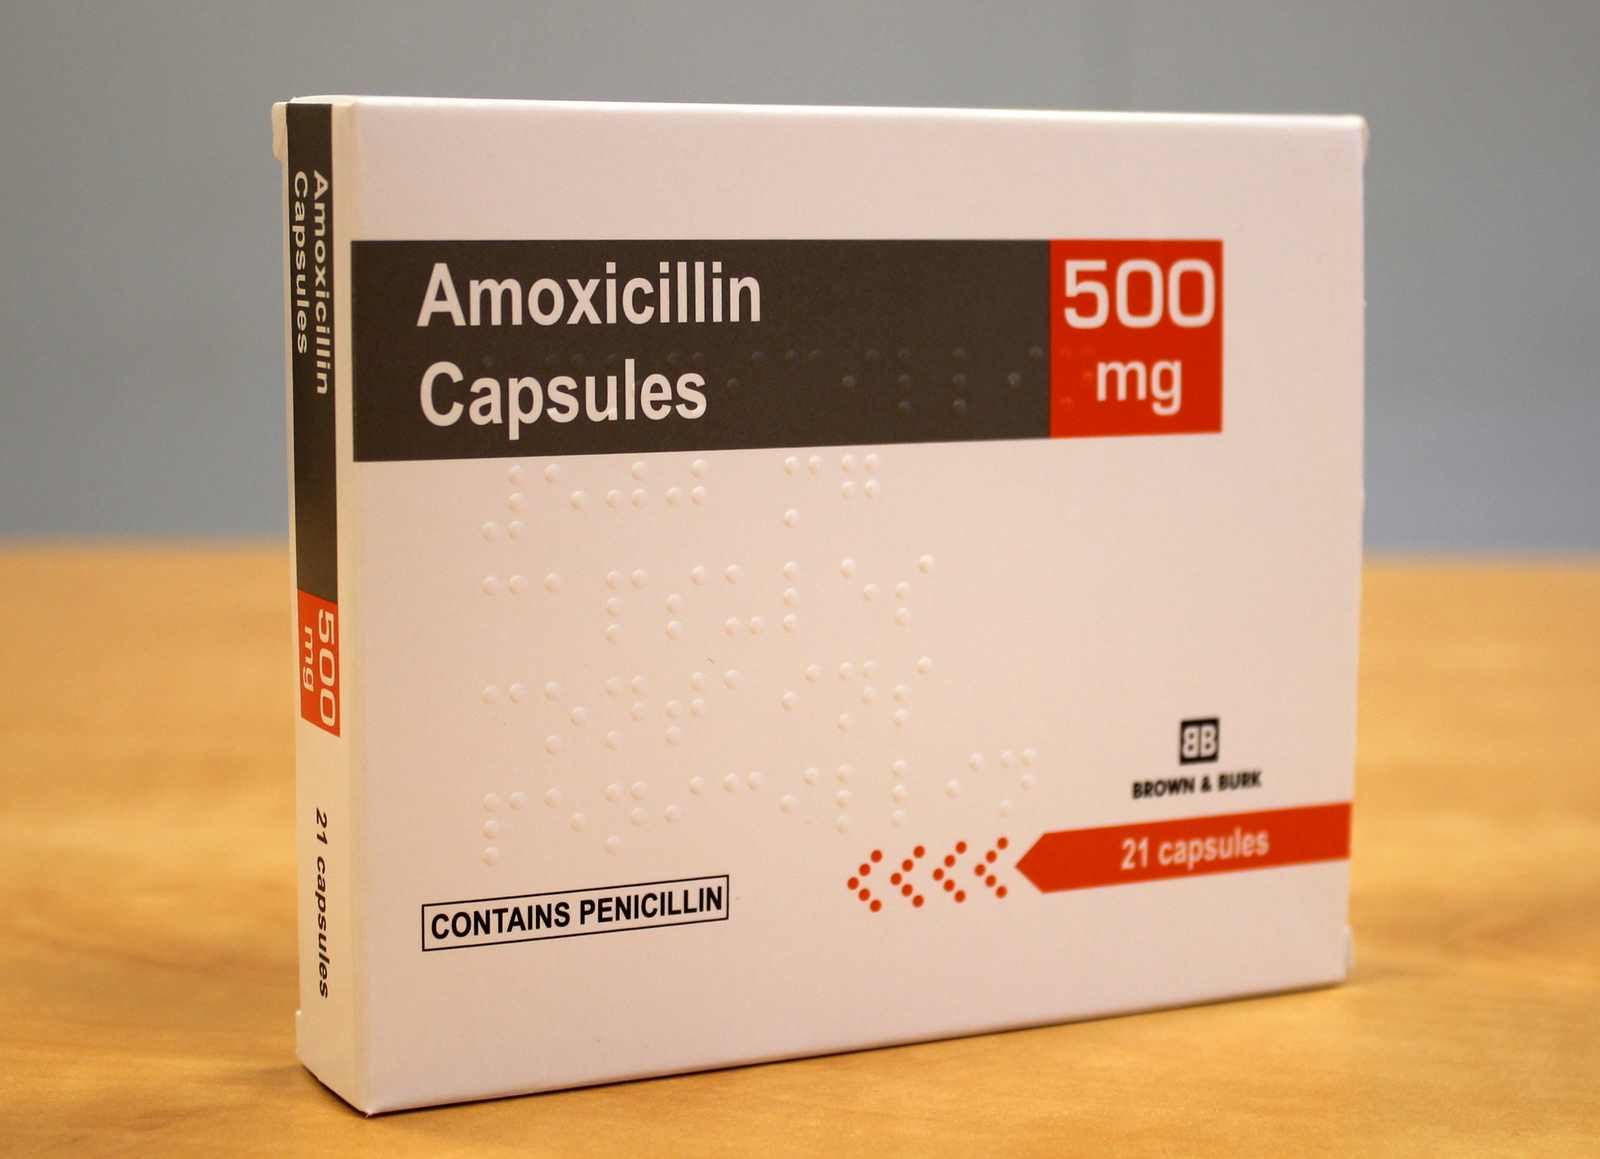 Amoxicillin Capsules 500mg